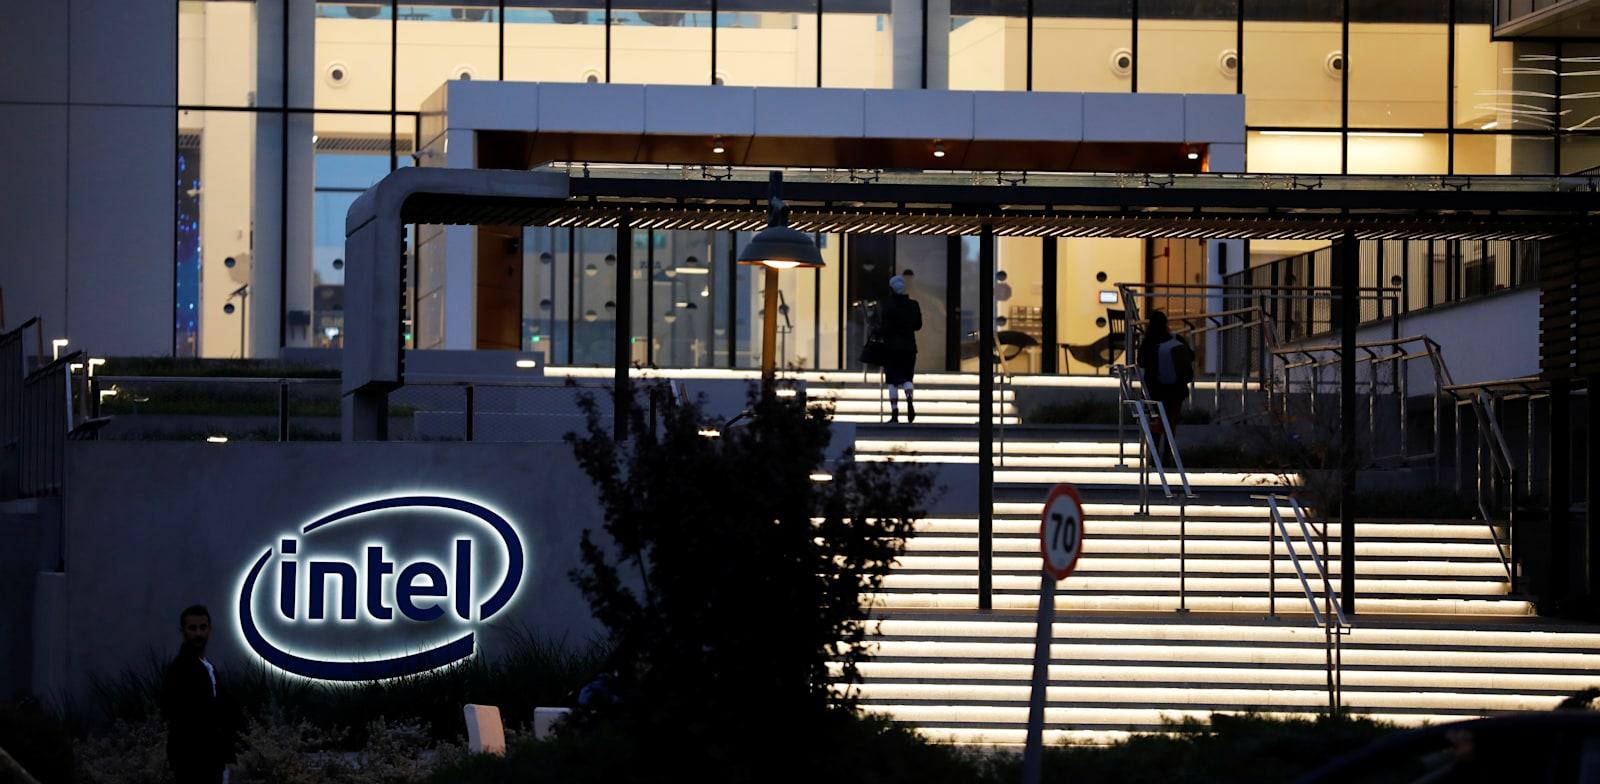 Intel Petah Tikva office Photo: Reuters, Amir Cohen